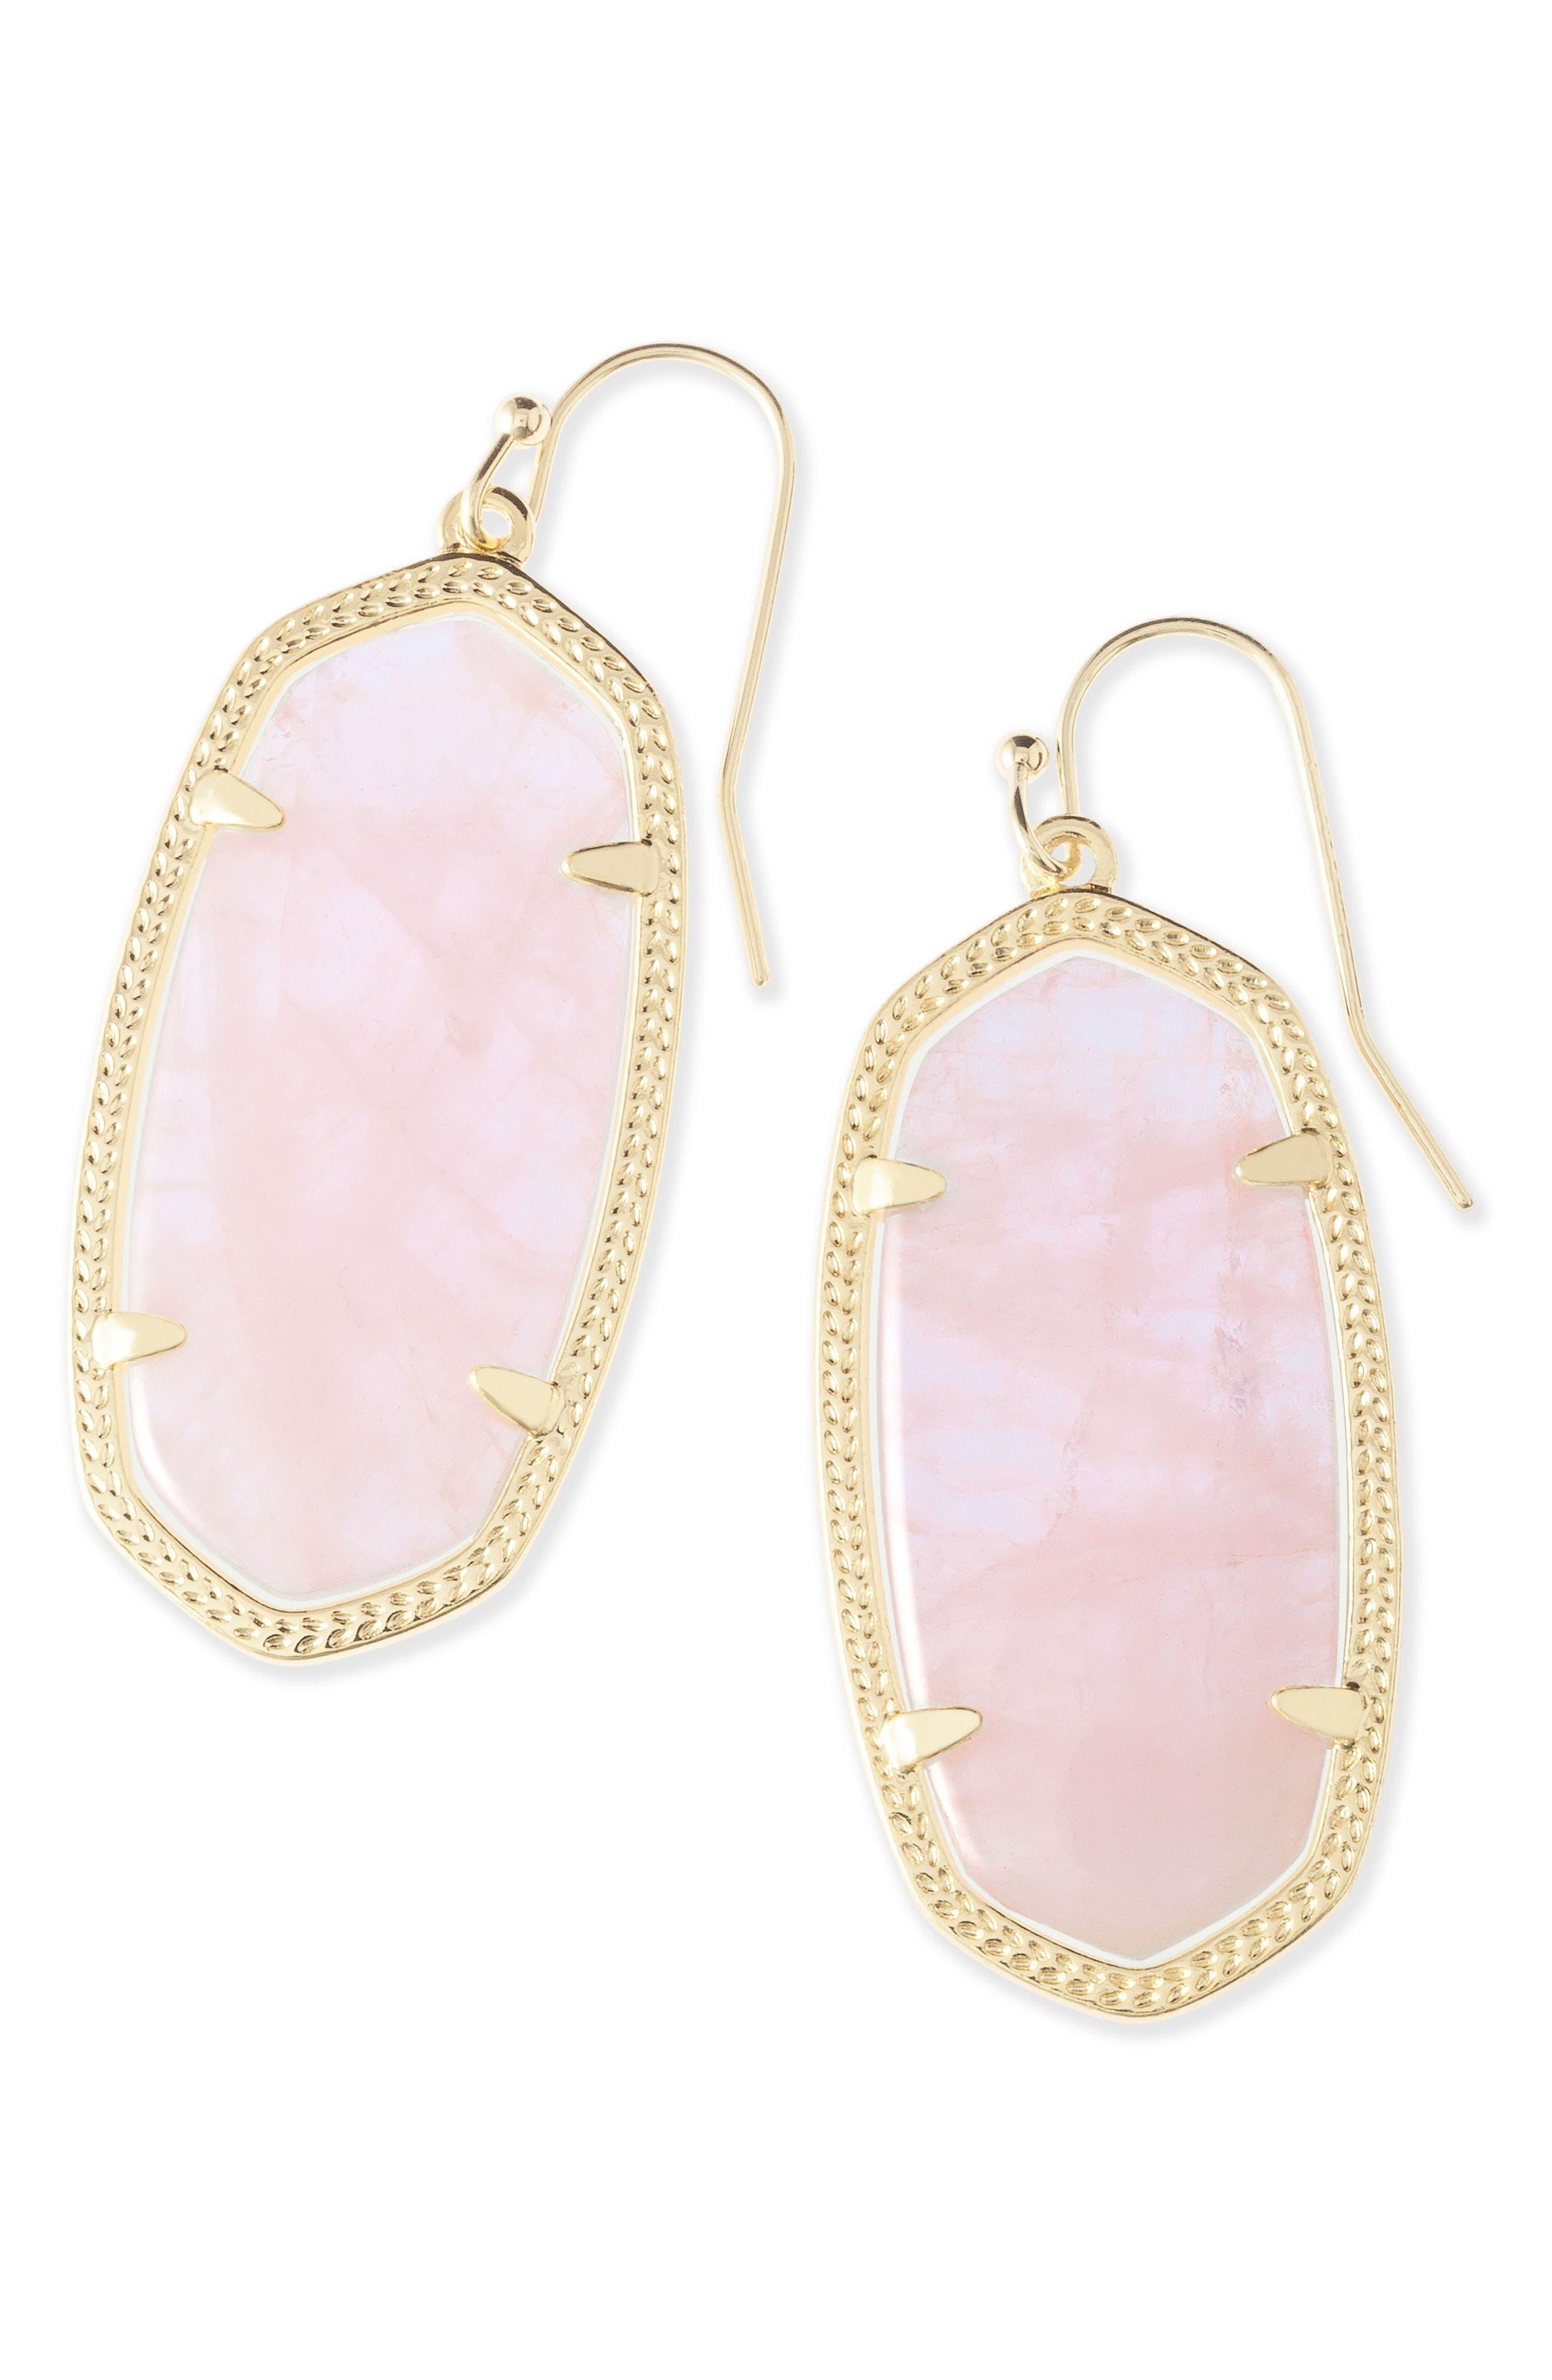 Elle Drop Earrings,                             Alternate thumbnail 3, color,                             ROSE QUARTZ/ GOLD